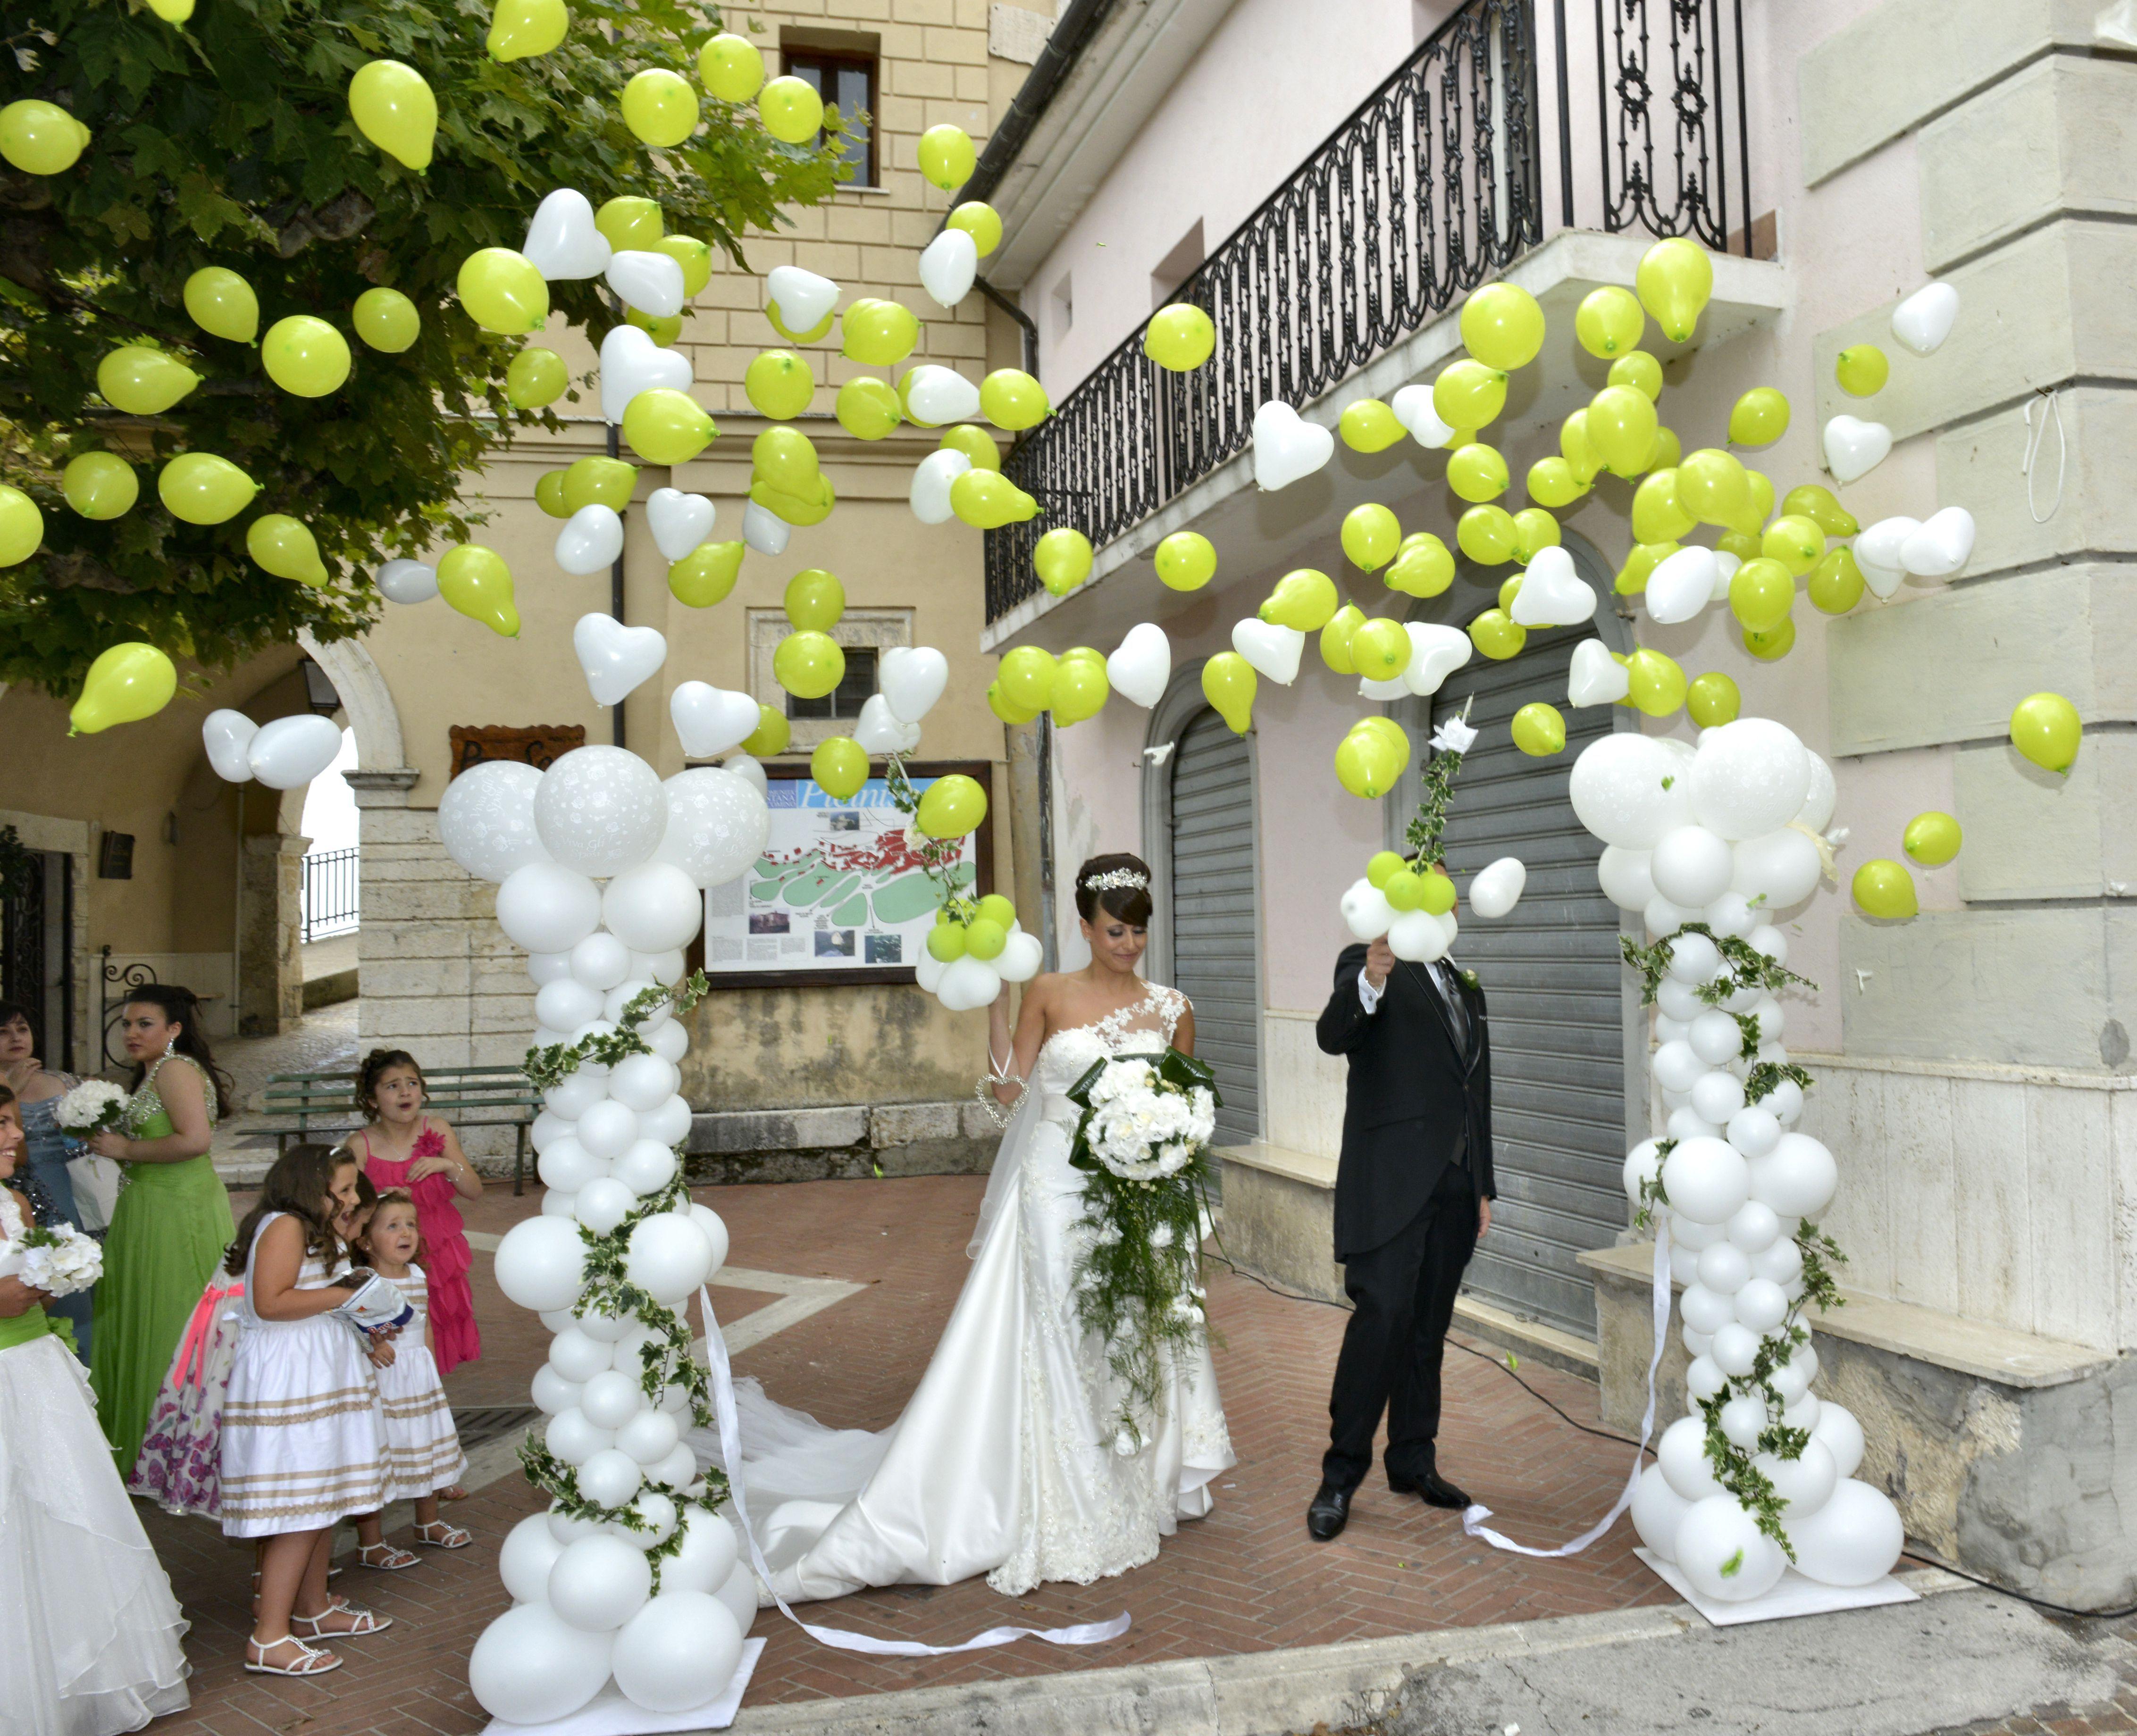 Wedding balloon Columns- Bursting Balloons